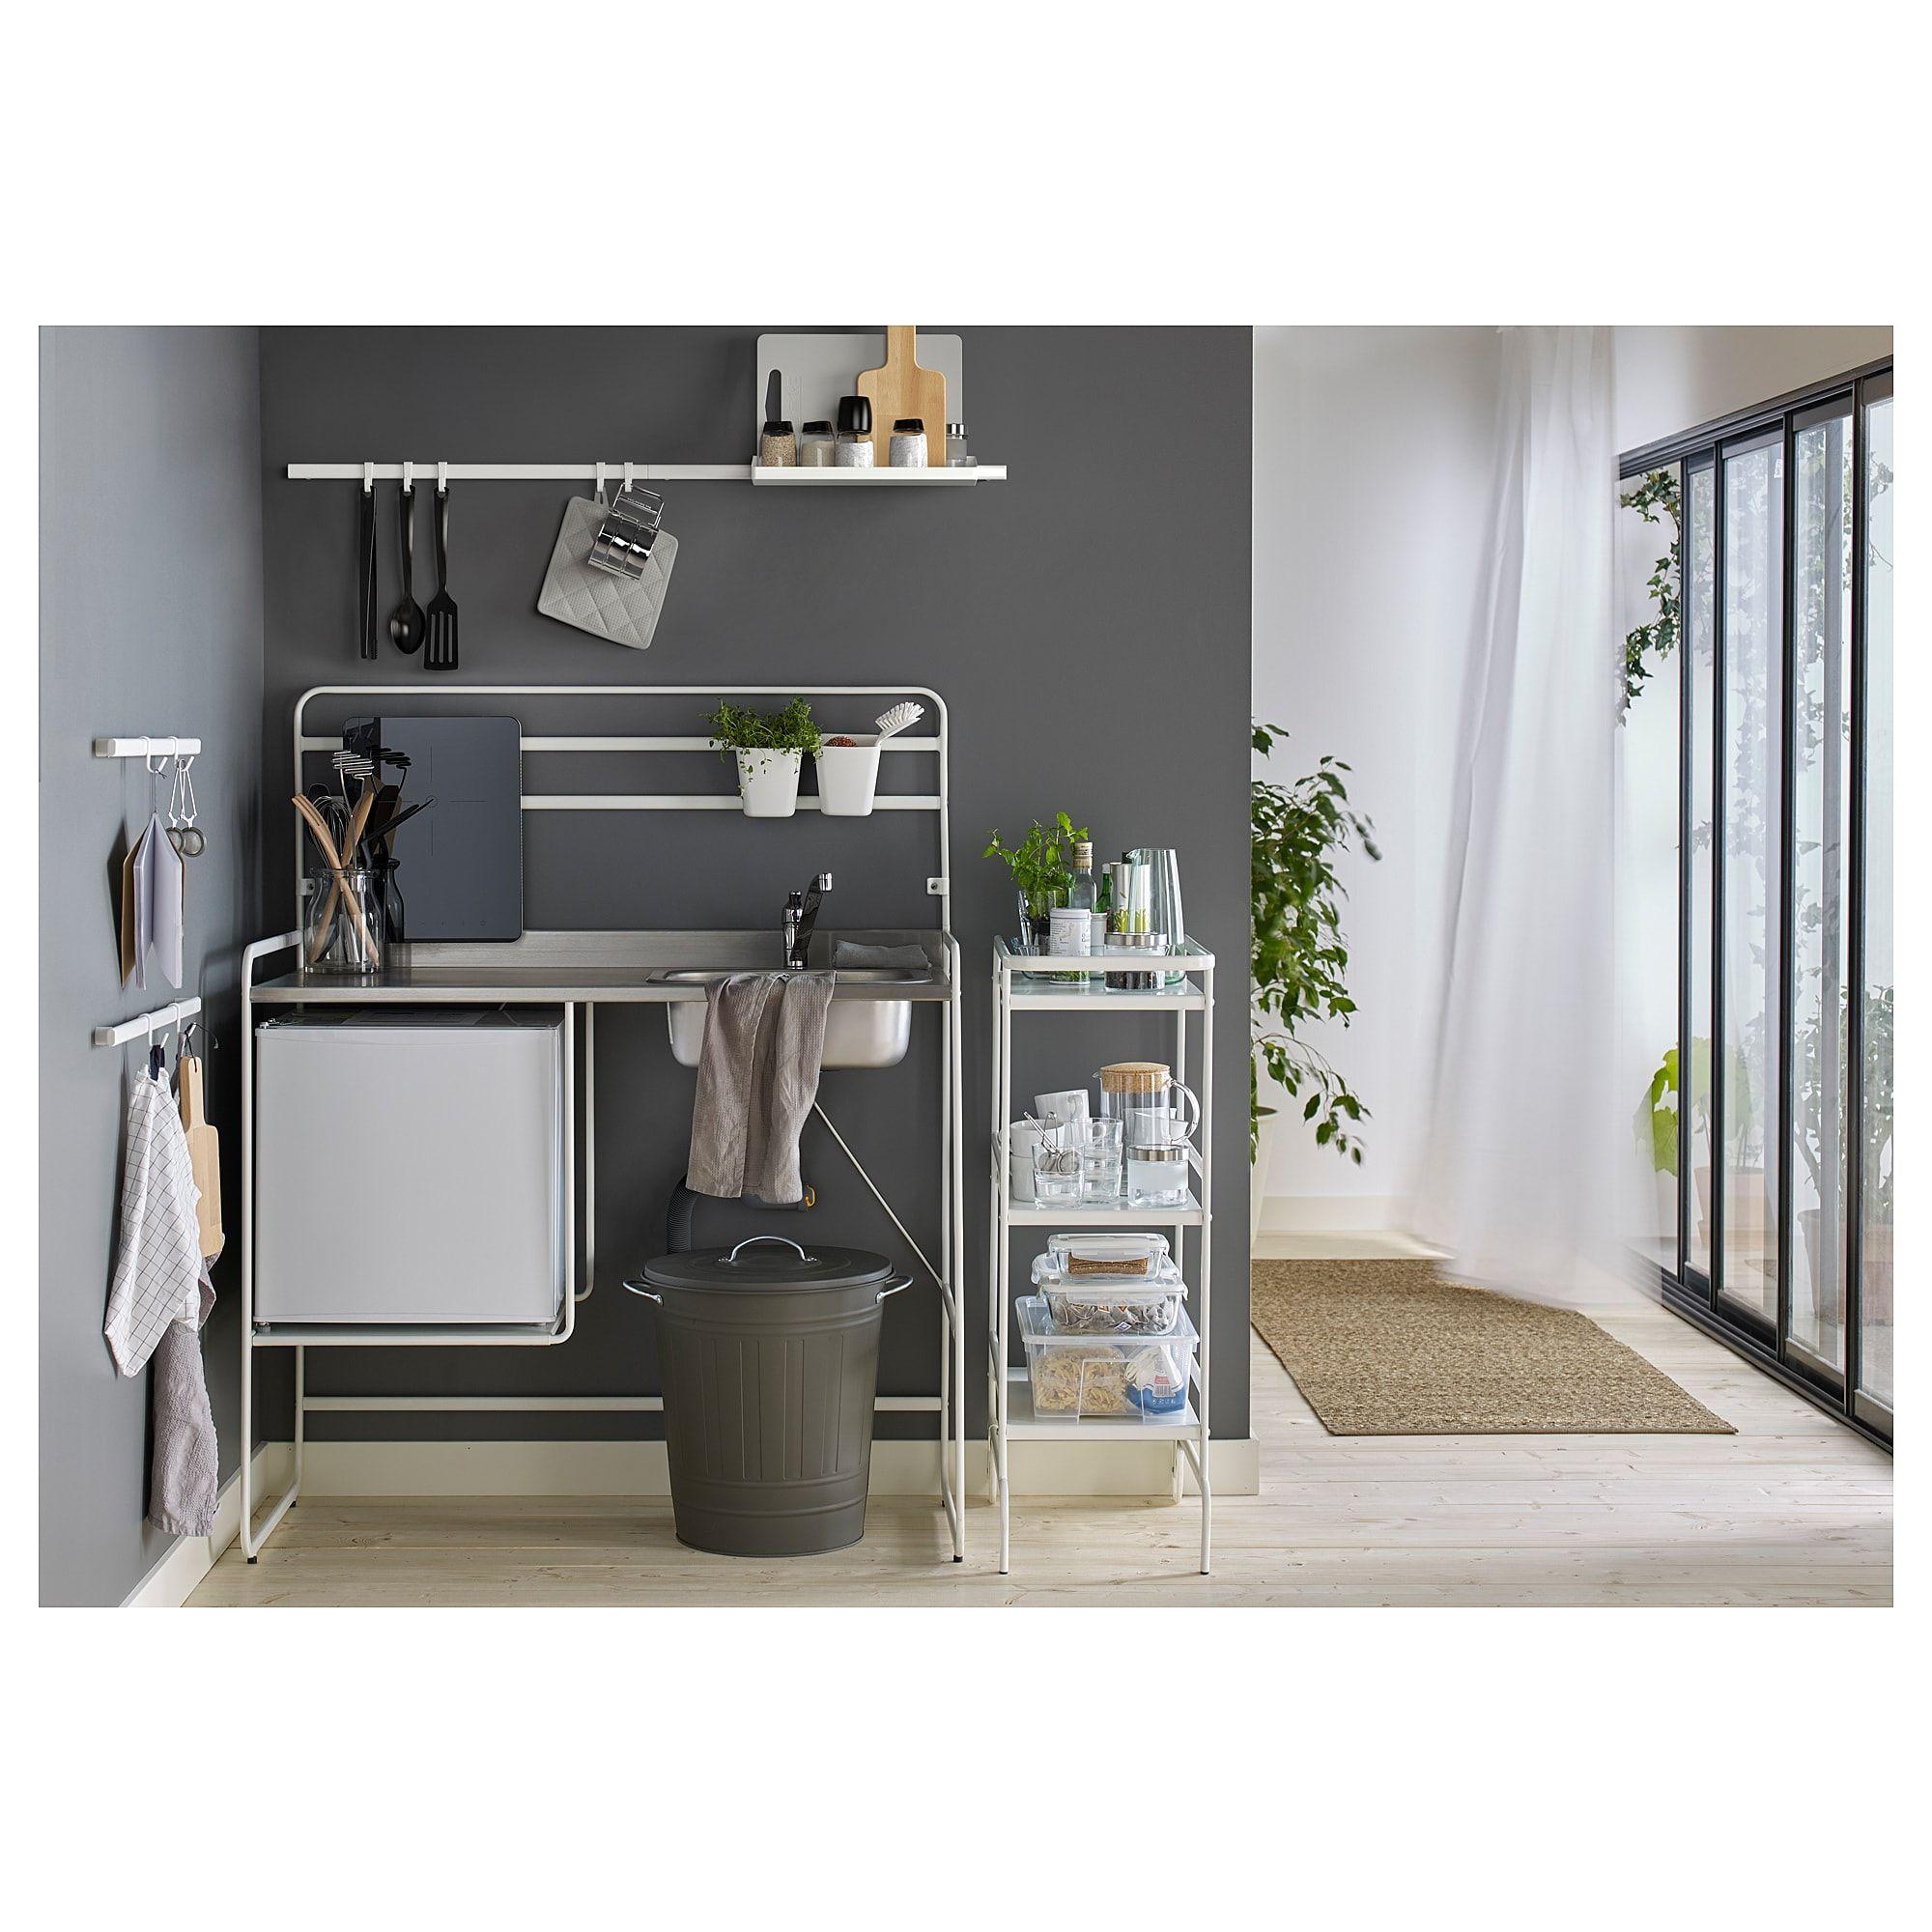 SUNNERSTA Shelf Mini kitchen, Ikea, Kitchen design